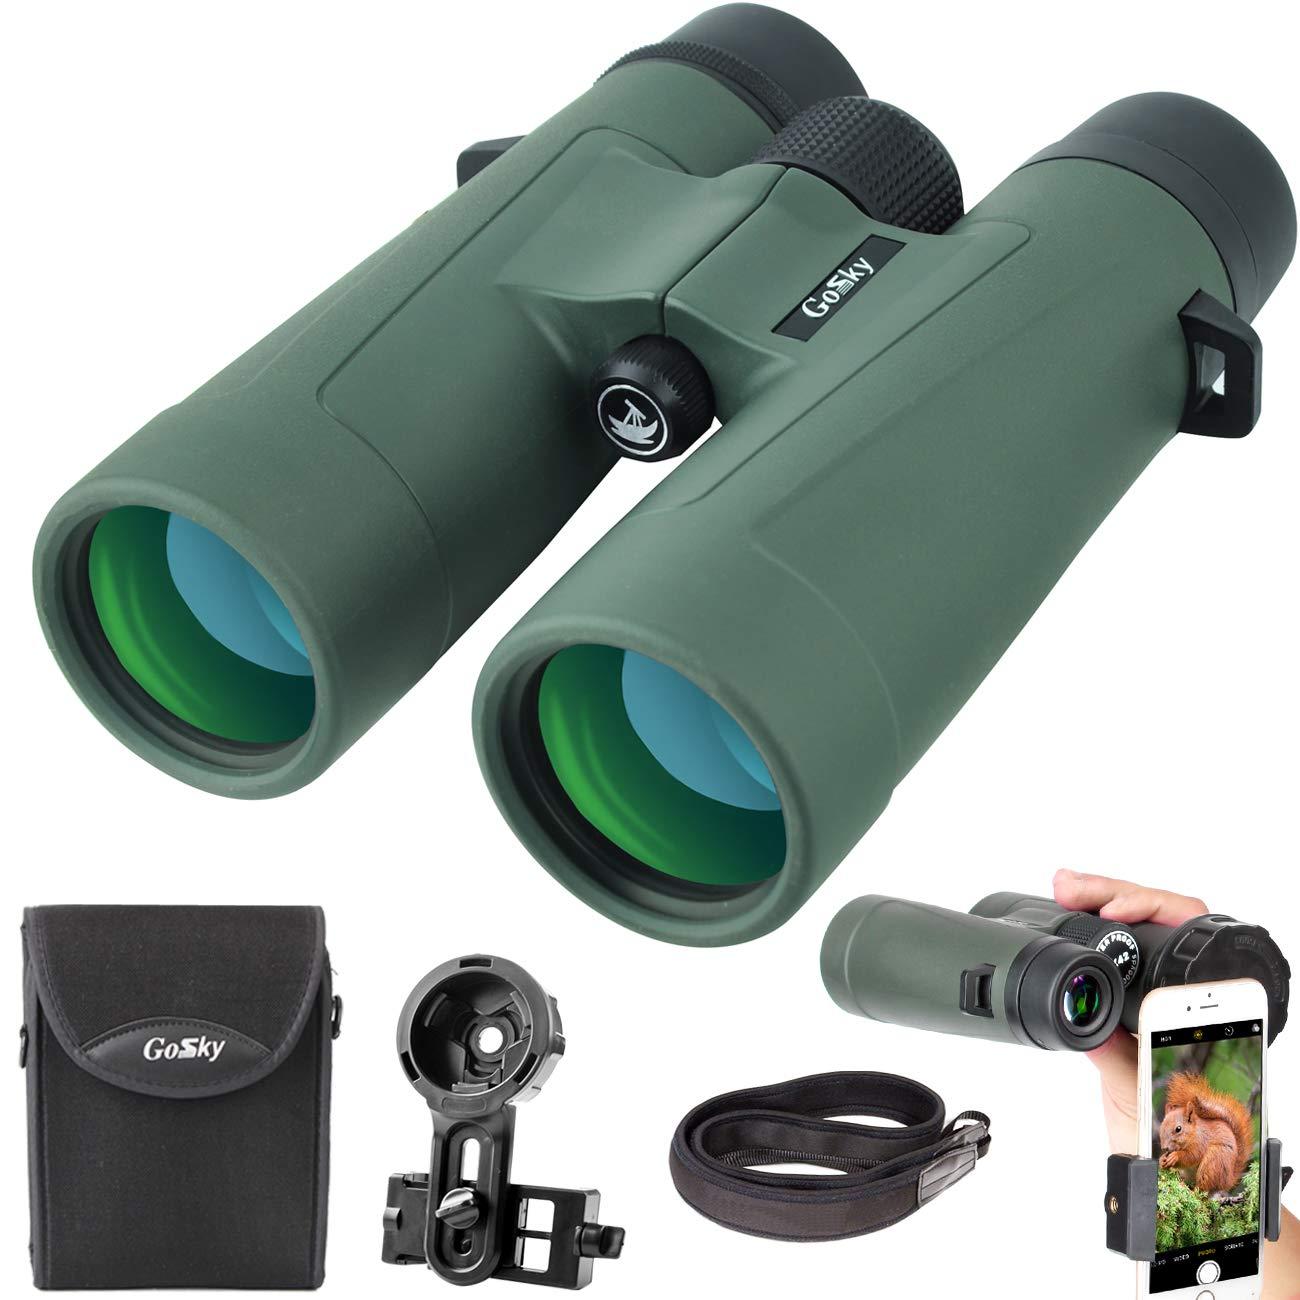 Gosky T-Ring for 35 mm Nikon Camera (Fits All Nikon SLR Cameras) Everest 4332013457